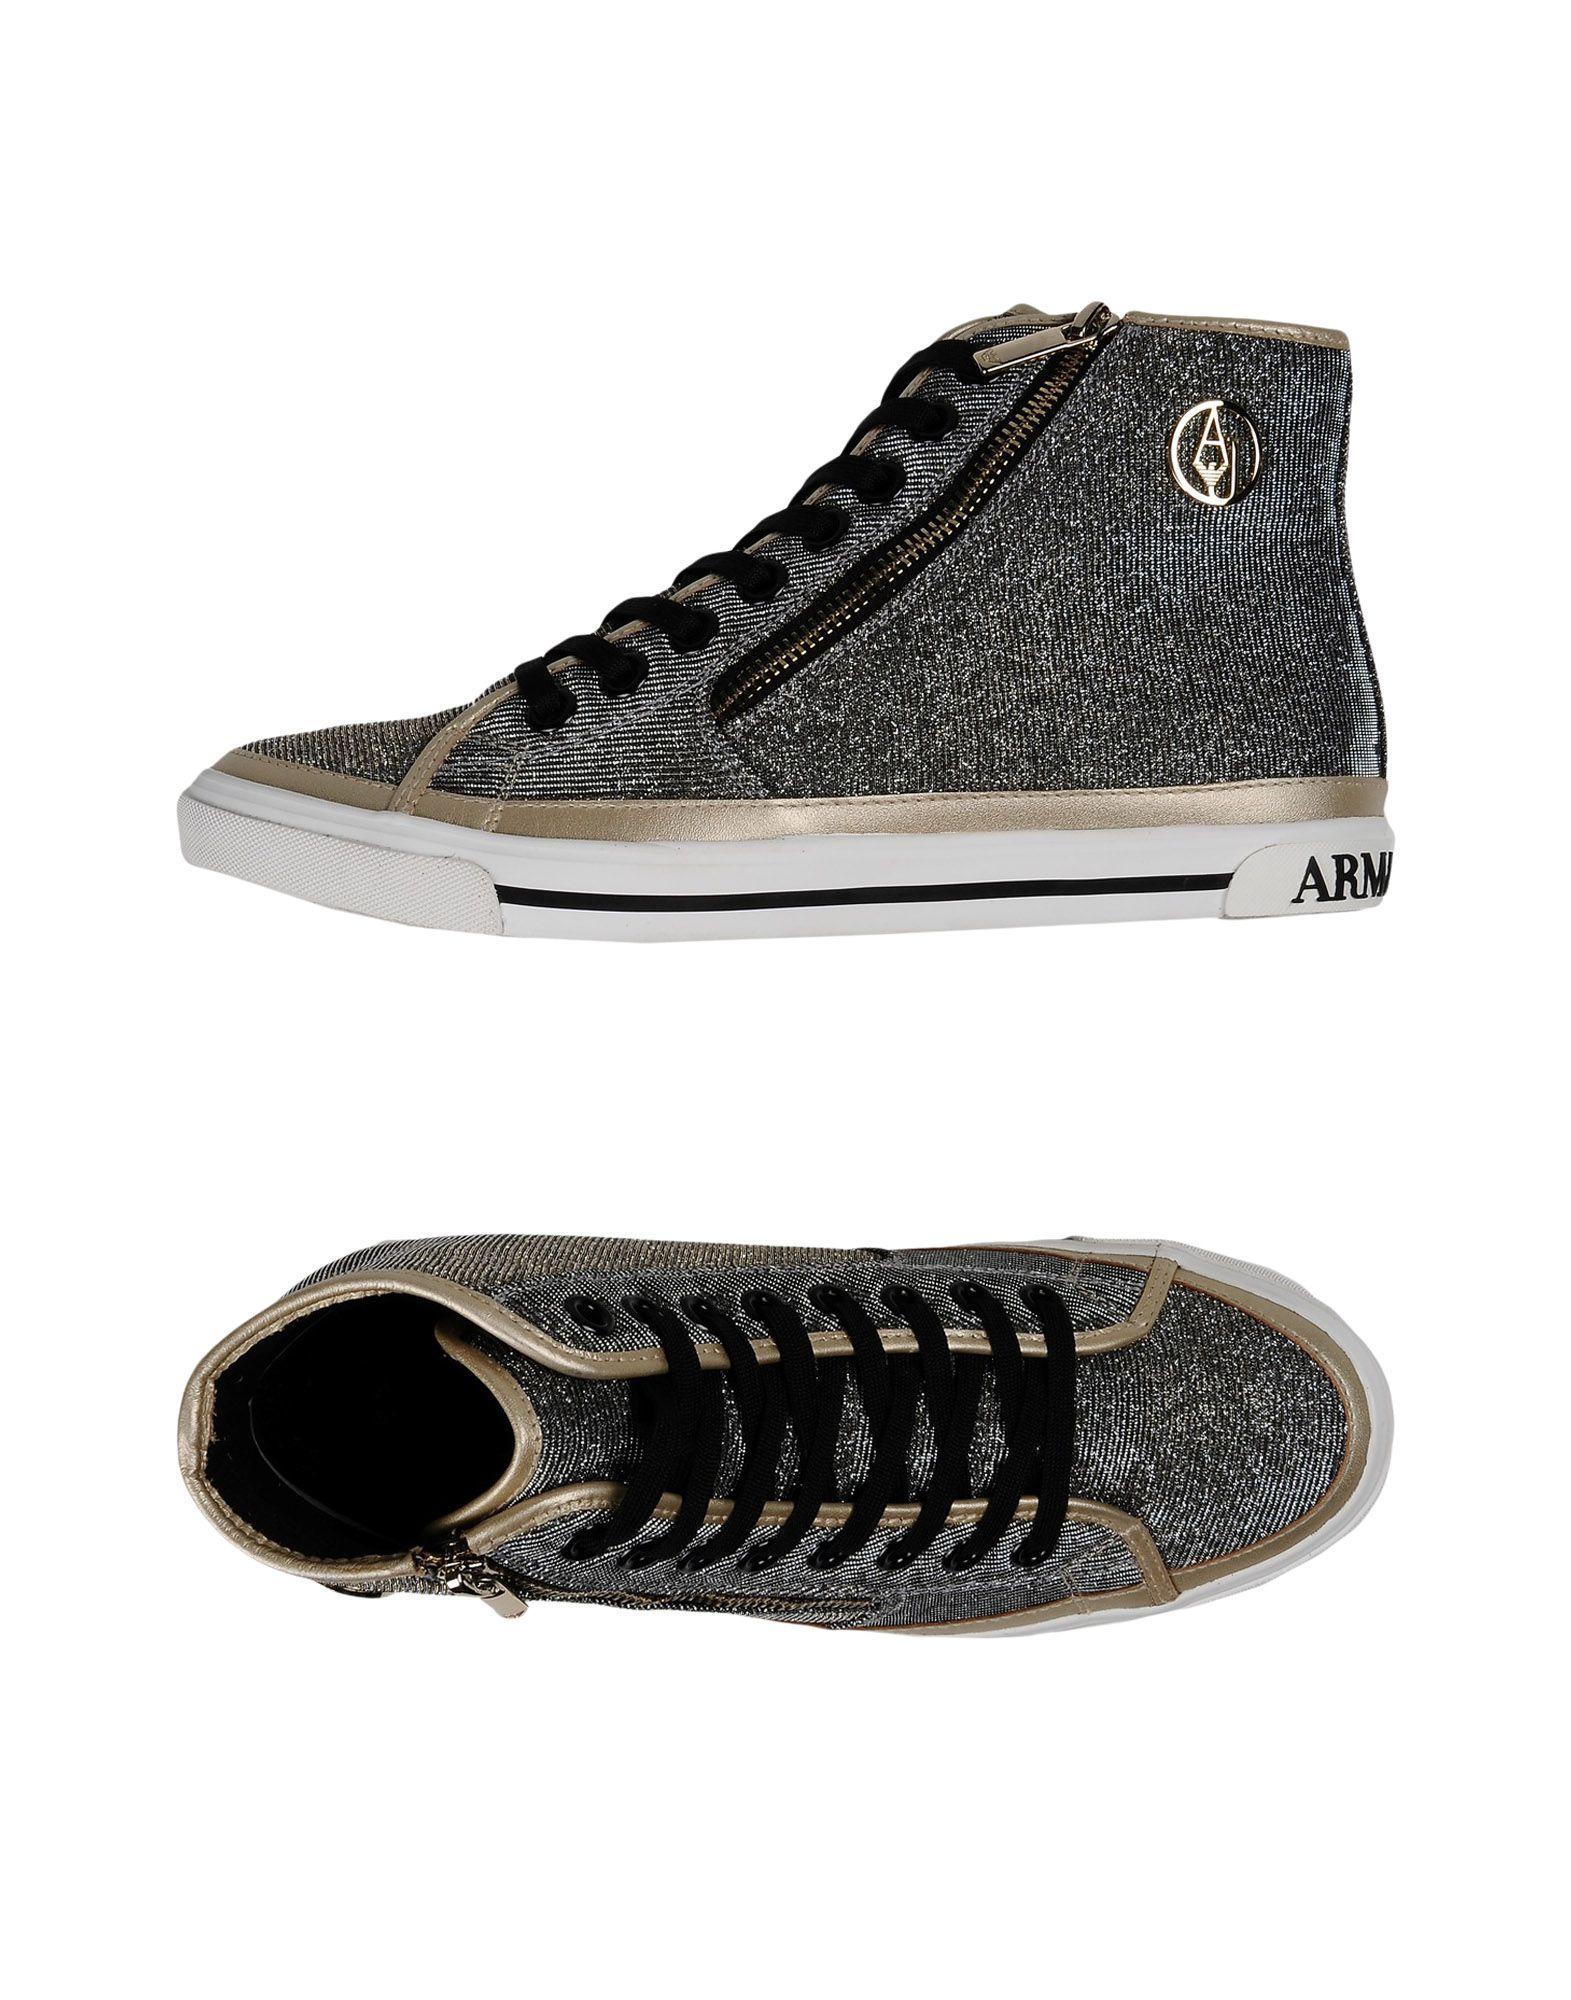 Armani Jeans Sneakers Damen  11324020BB Gute Qualität beliebte Schuhe